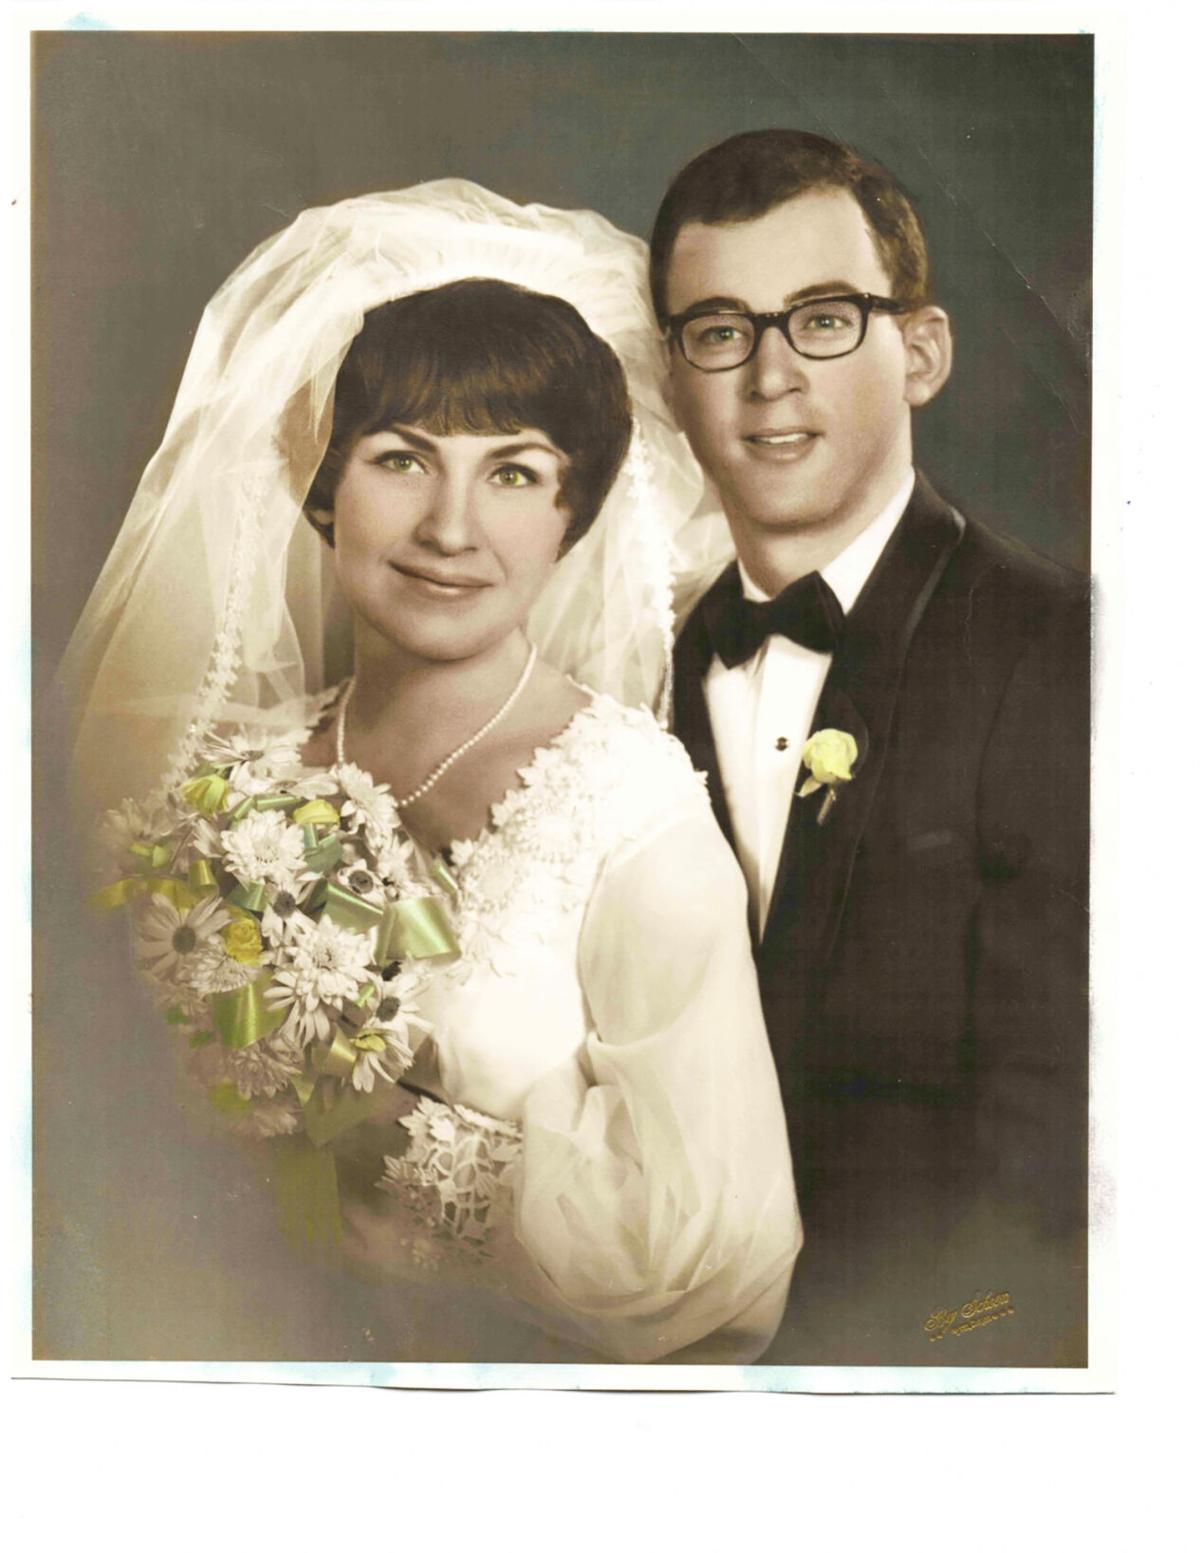 Kent and Jolene Rupp wedding photo